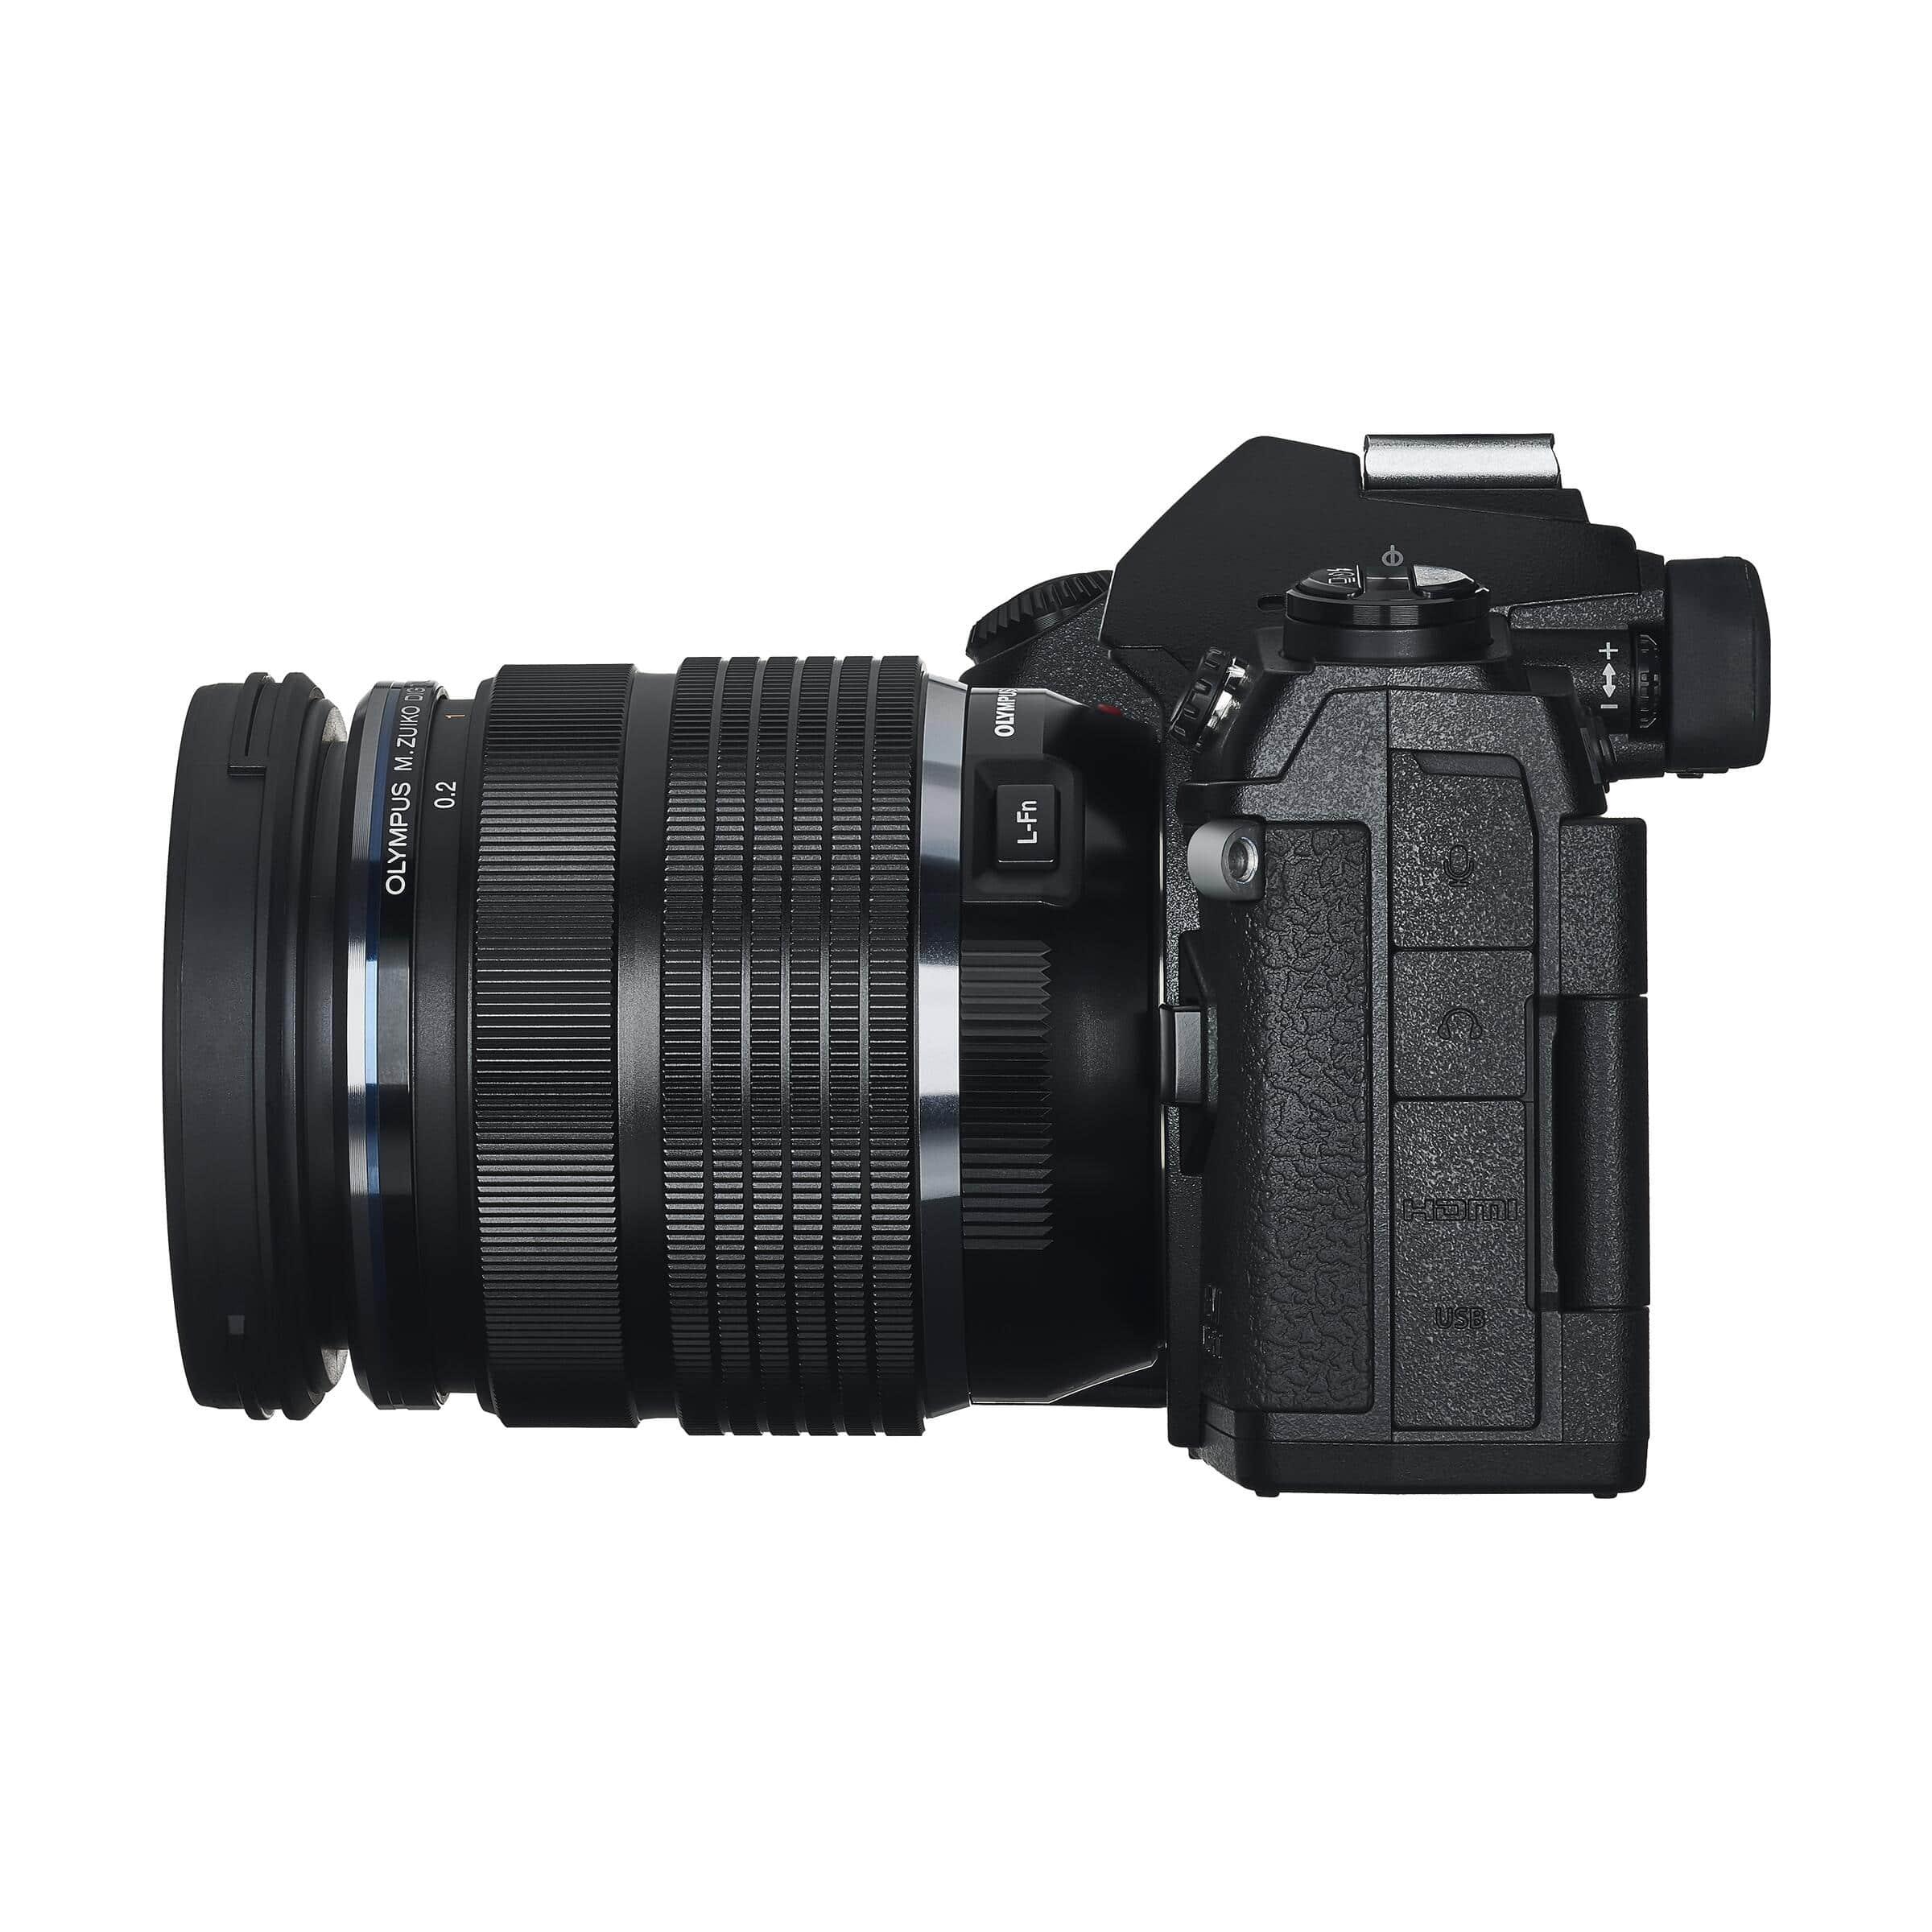 Olympus OM-D E-M1 Mark III + ED 12-40mm PRO